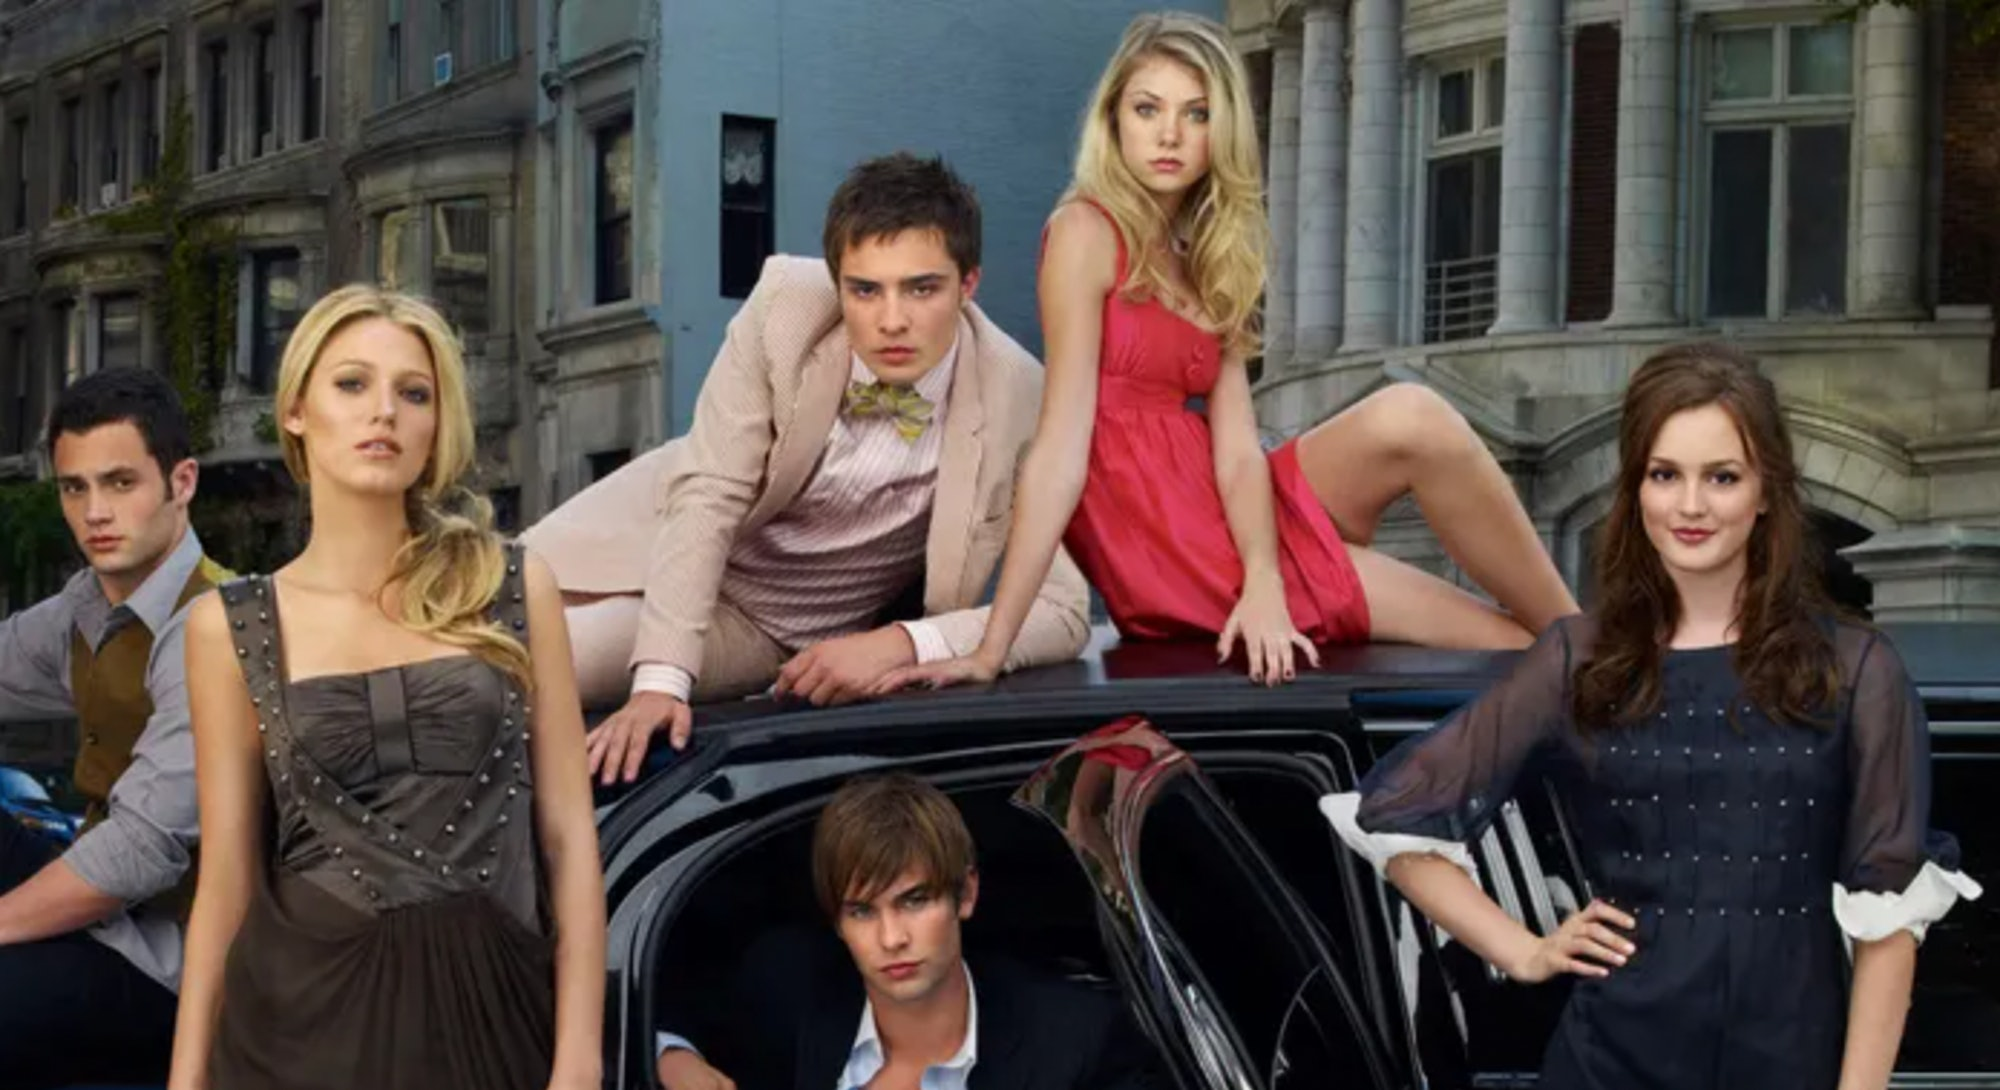 The original Gossip Girl cast.